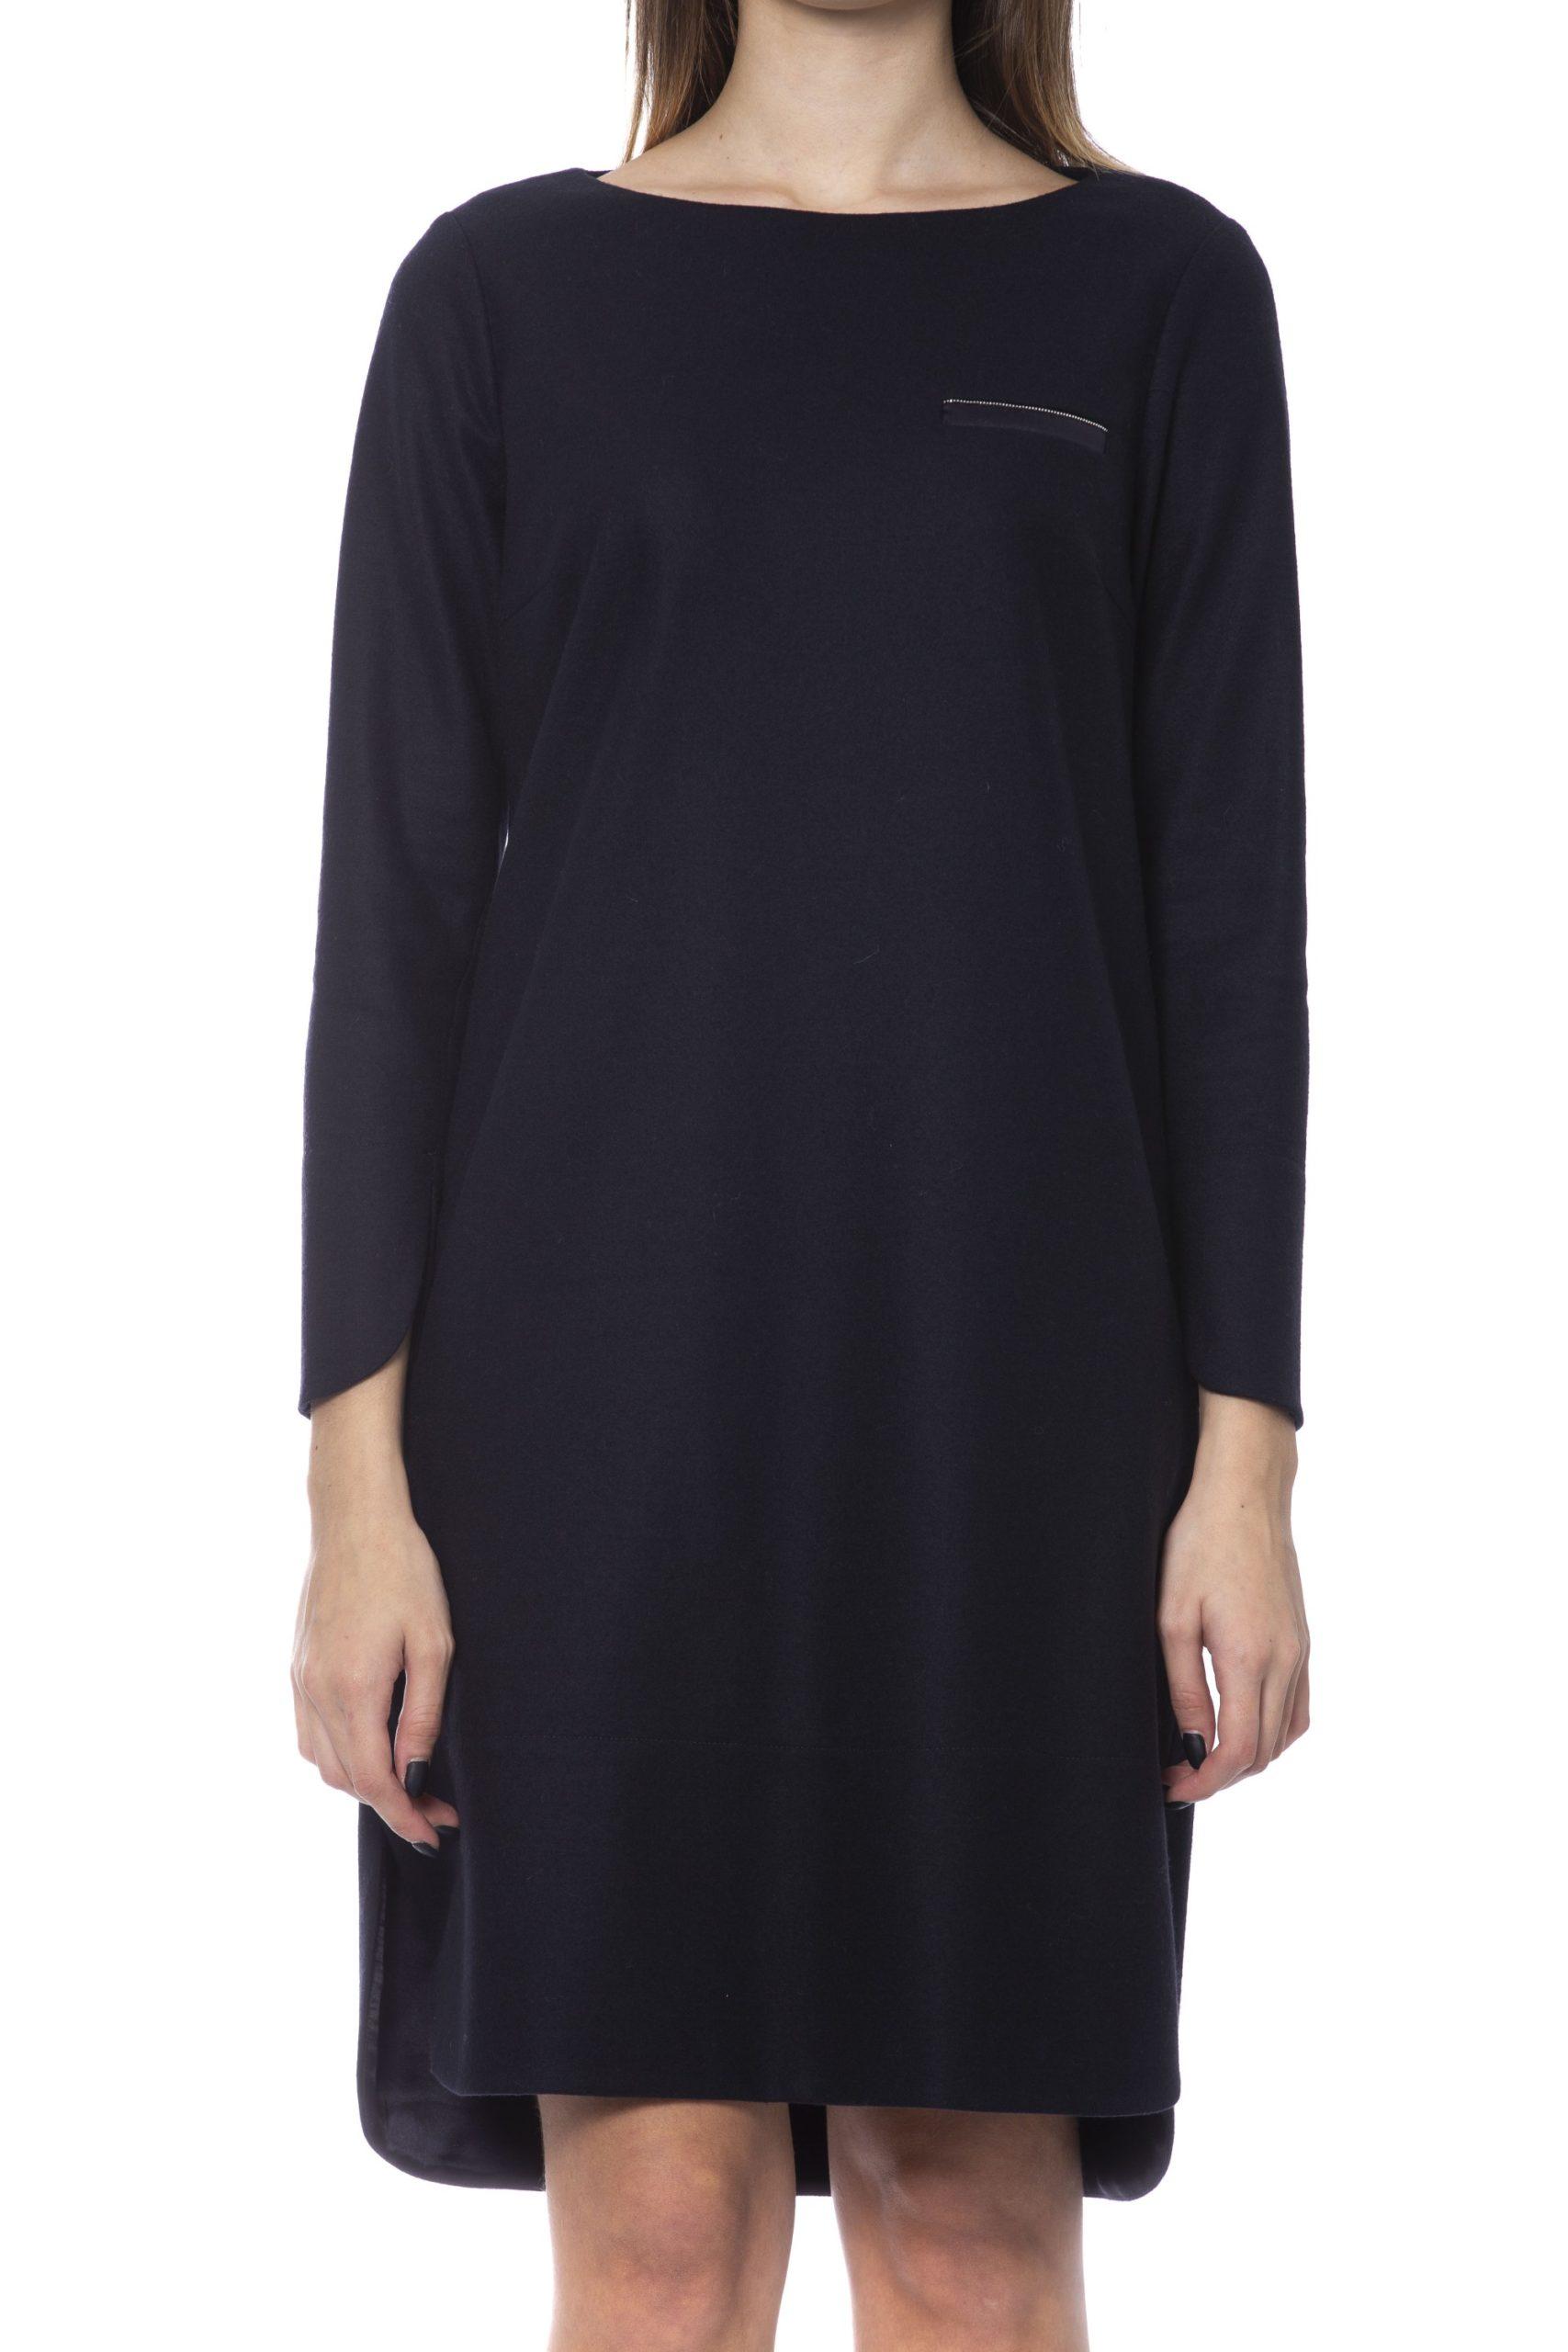 Peserico Women's Dress Black PE992222 - IT42 | S